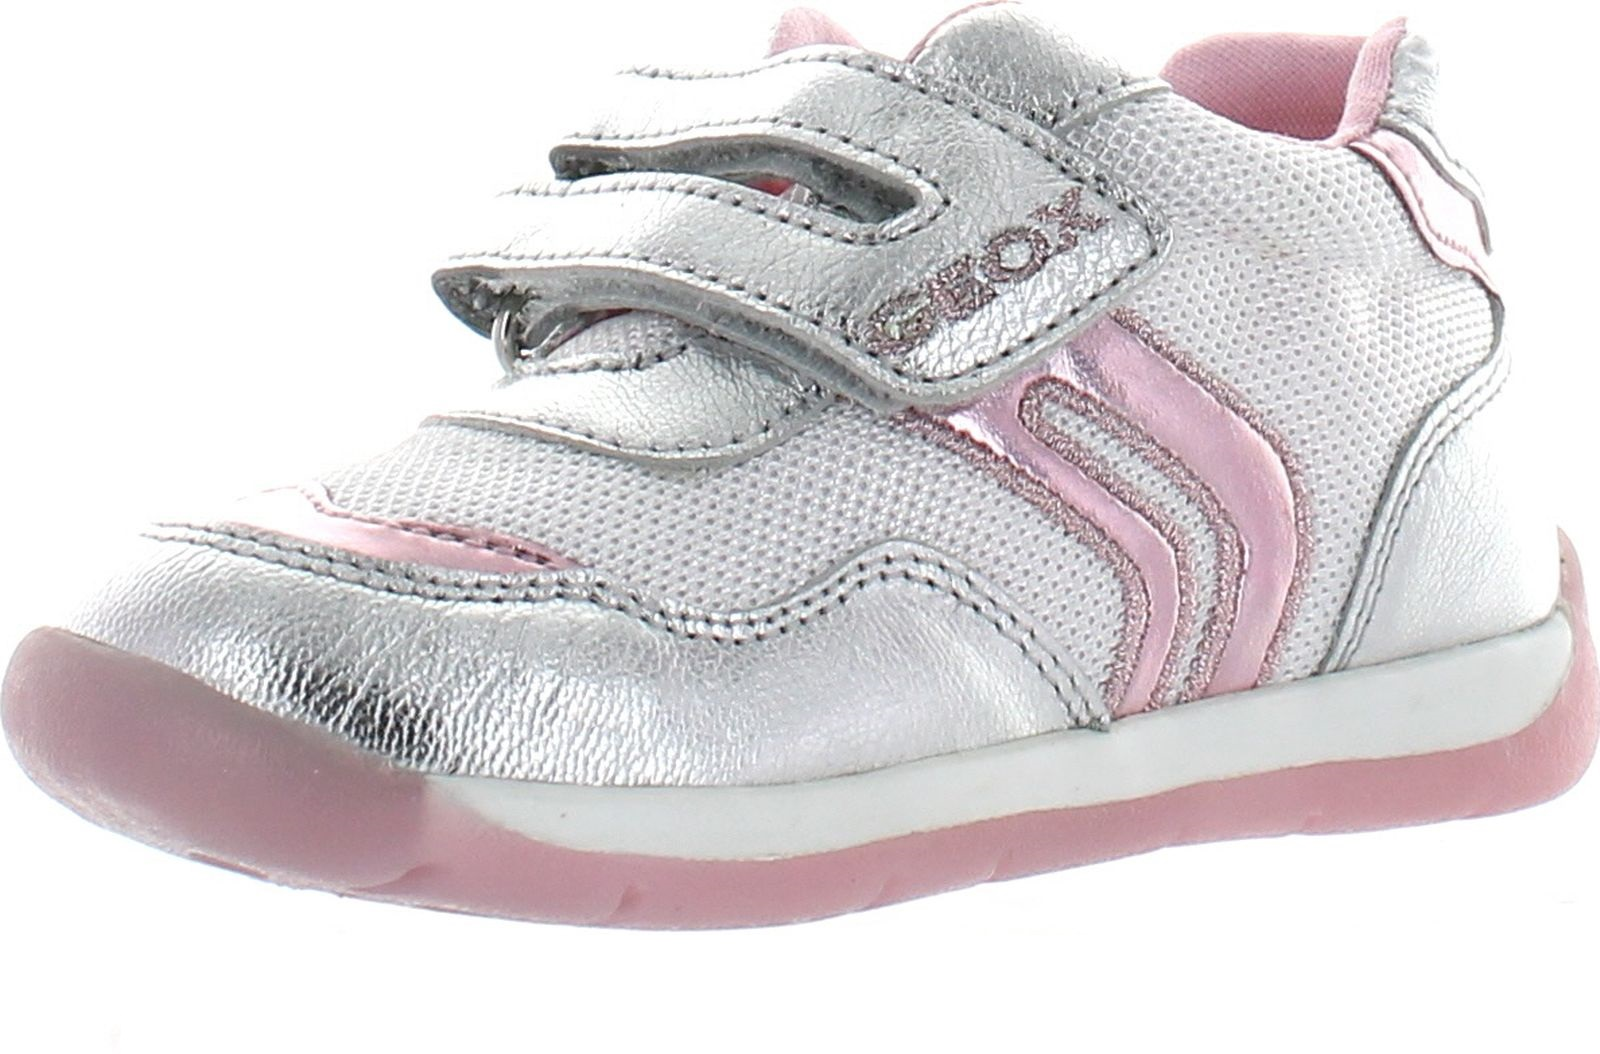 Geox Girls Baby Each Girl Fashion Sneakers